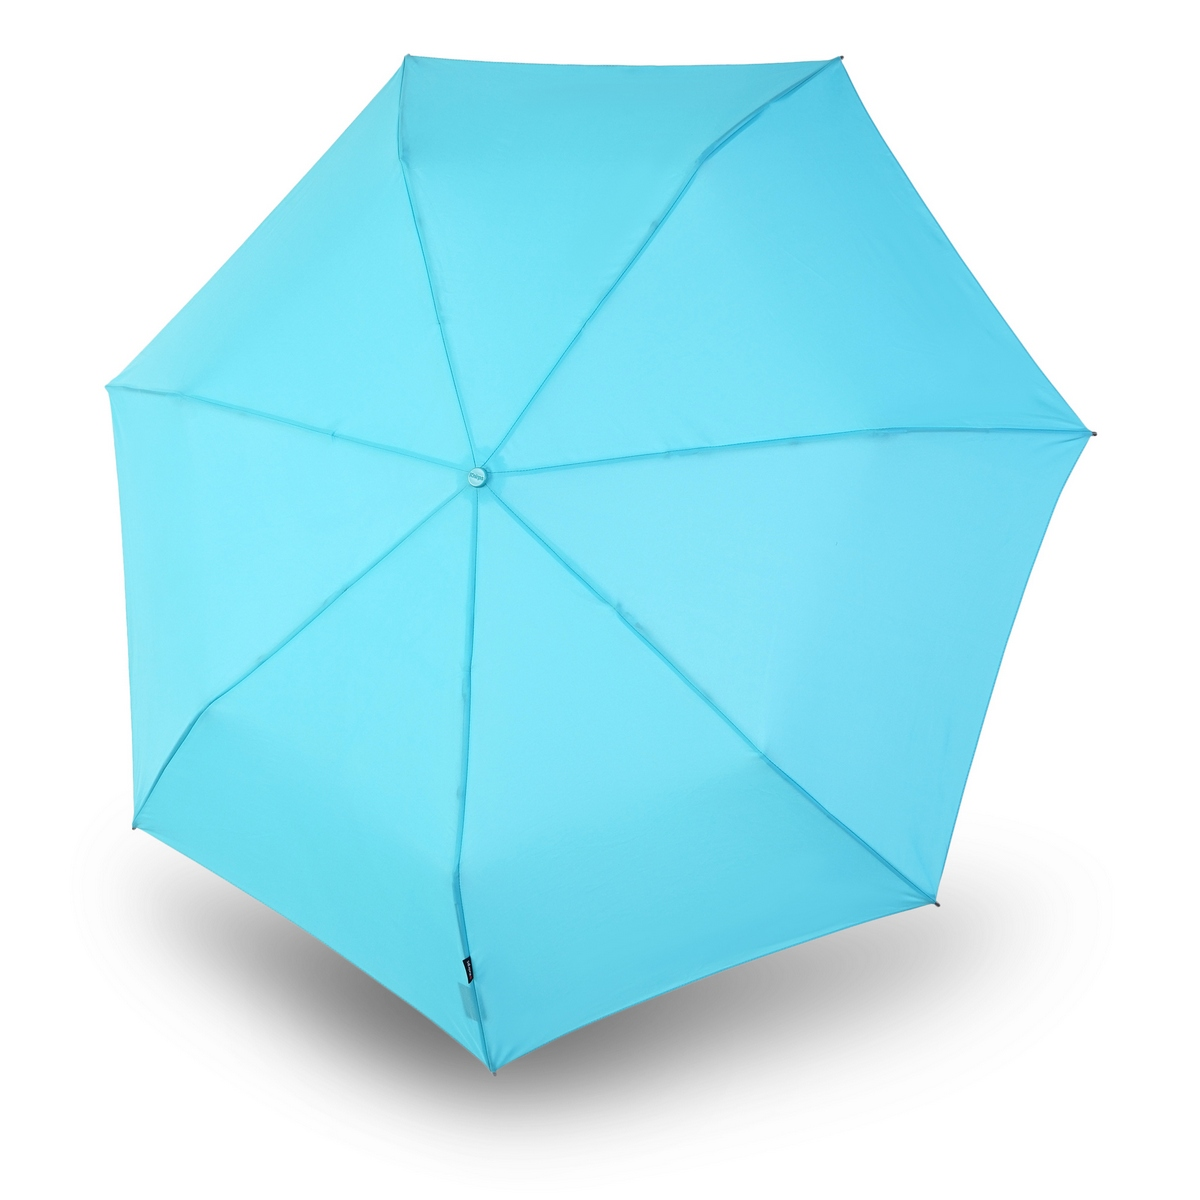 Зонт Knirps Floyd Duomatic, бирюзовый зонты